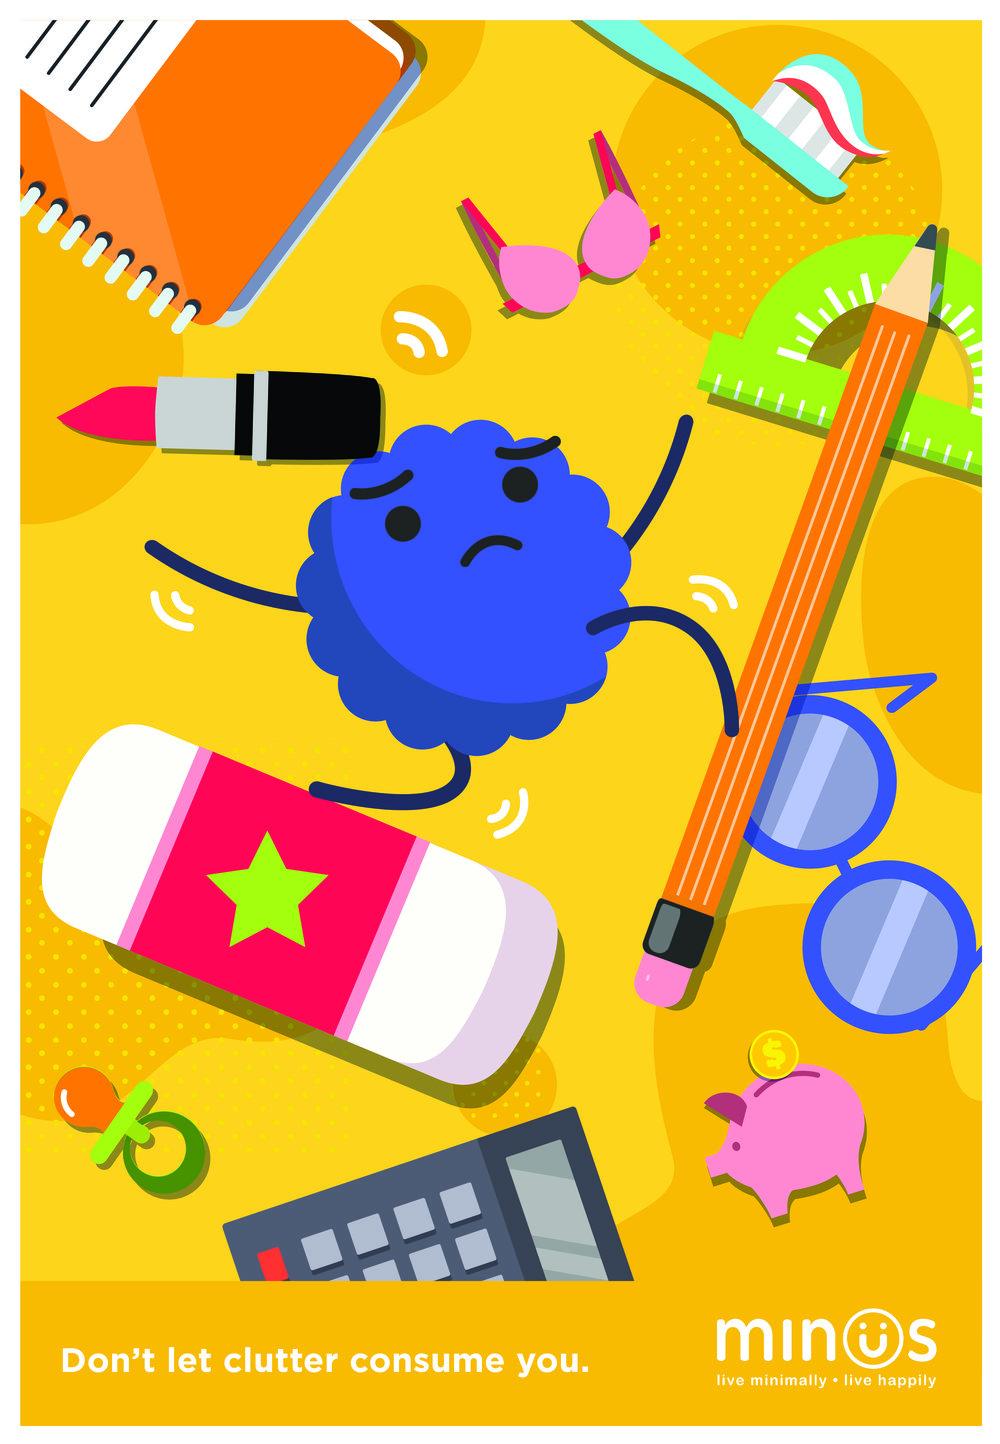 Workspace Clutter + Consumerism_Print_Illustration-01.jpg